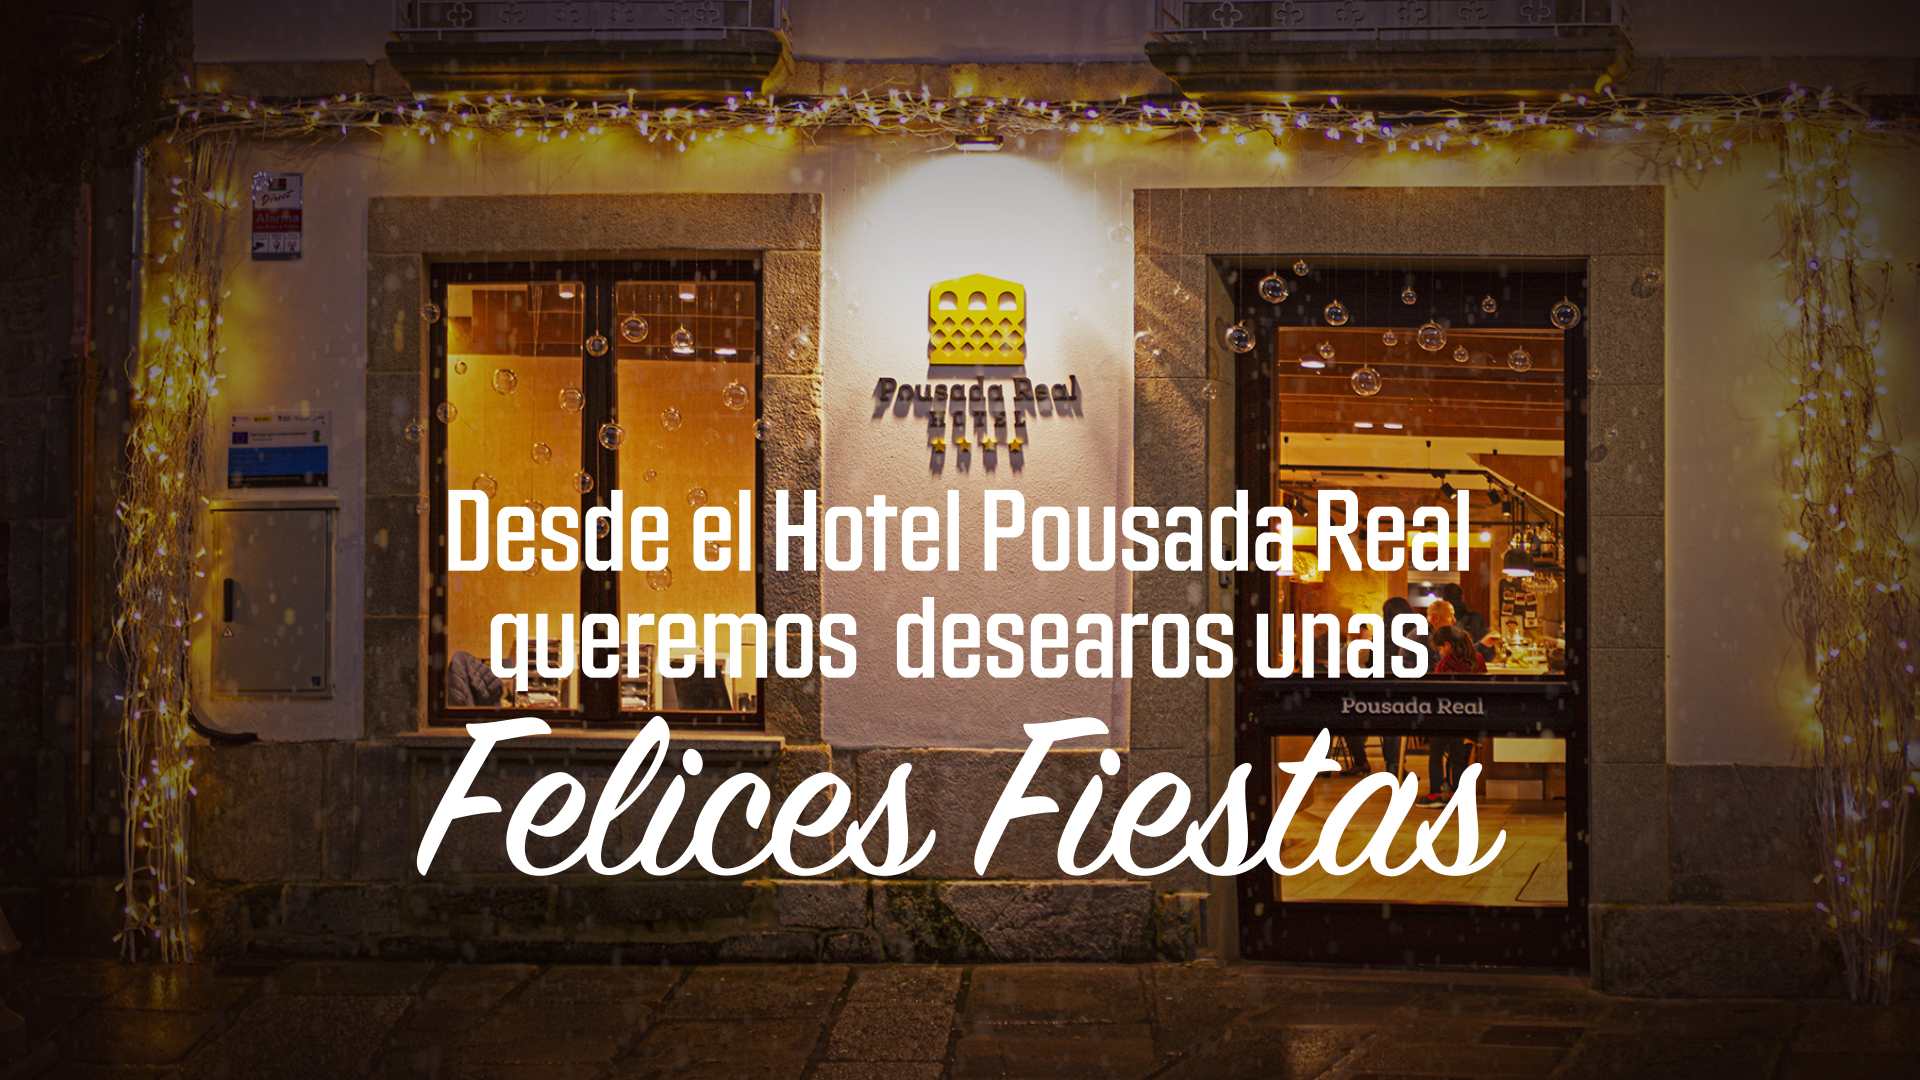 Hotel Pousada Real celebra su segunda Navidad